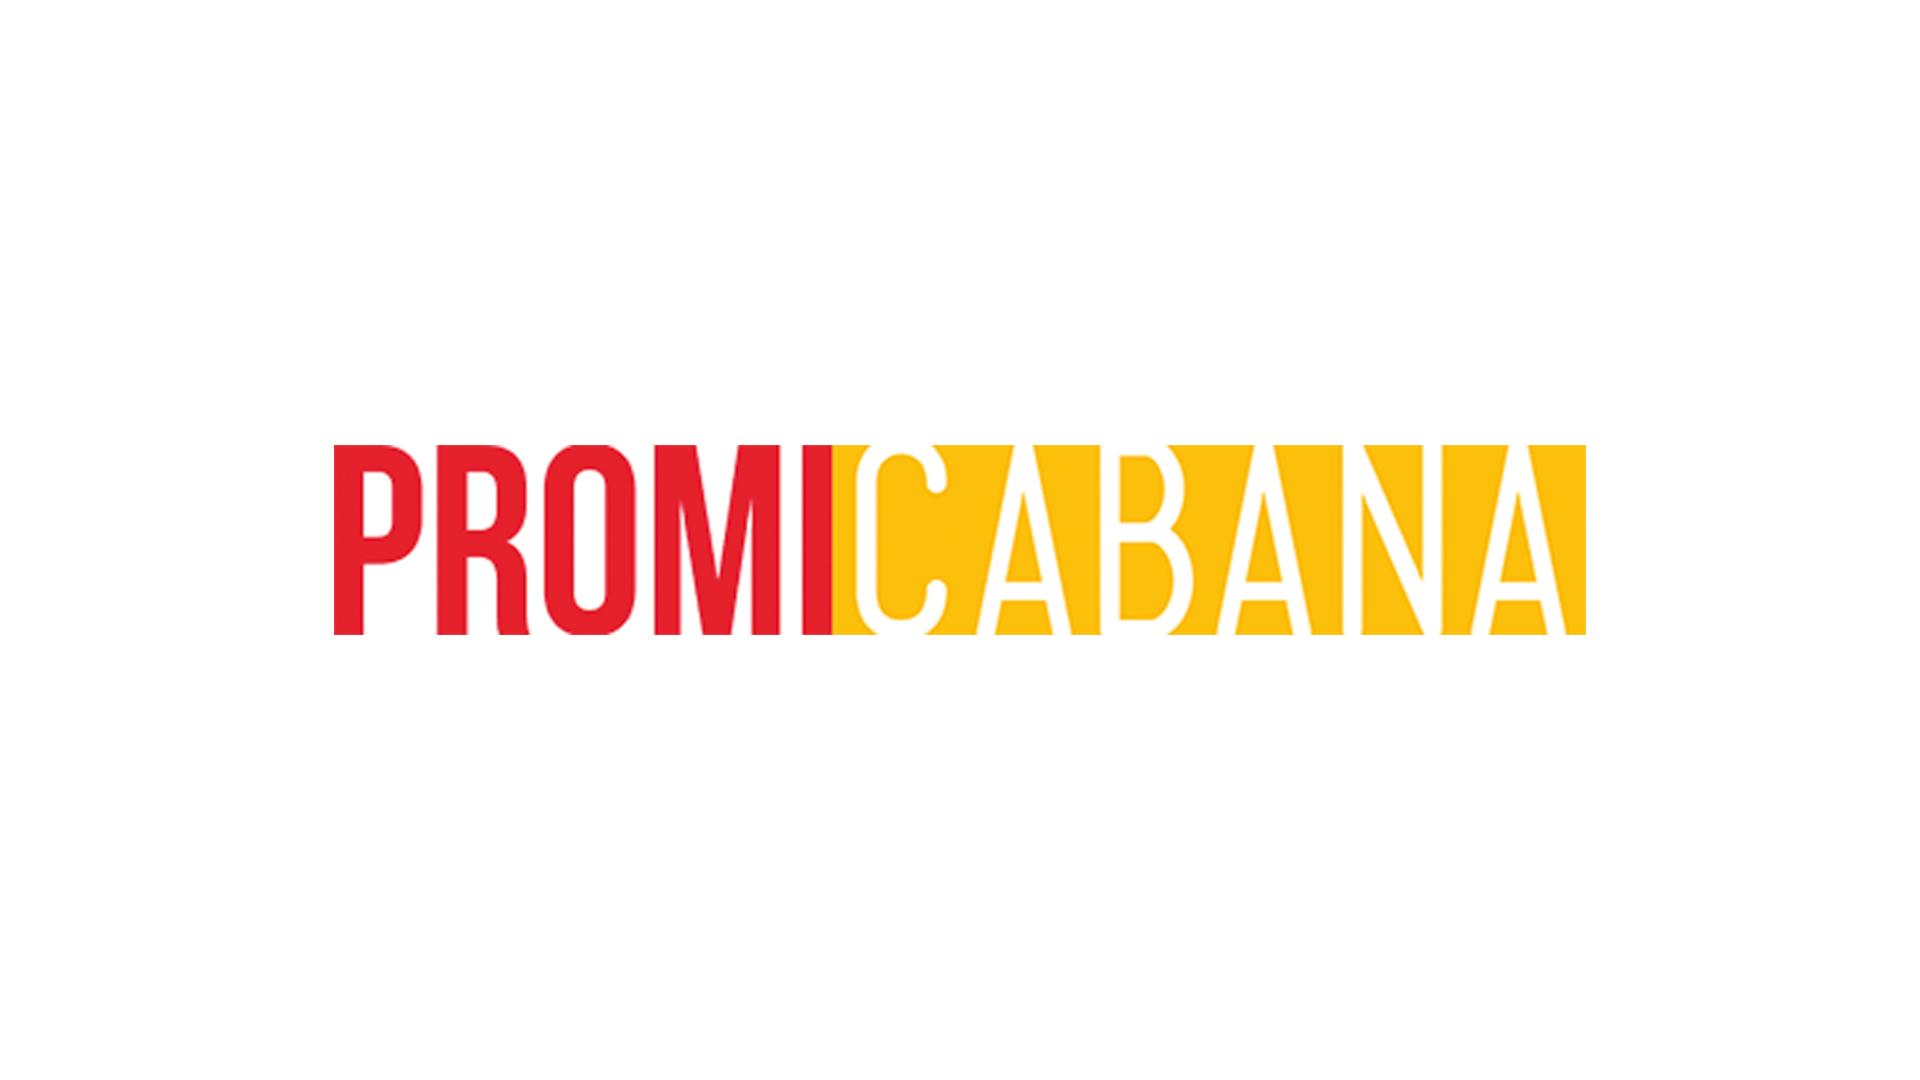 Mila-Kunis-James-Franco-Michelle-Williams-Oz-Premiere-Los-Angeles